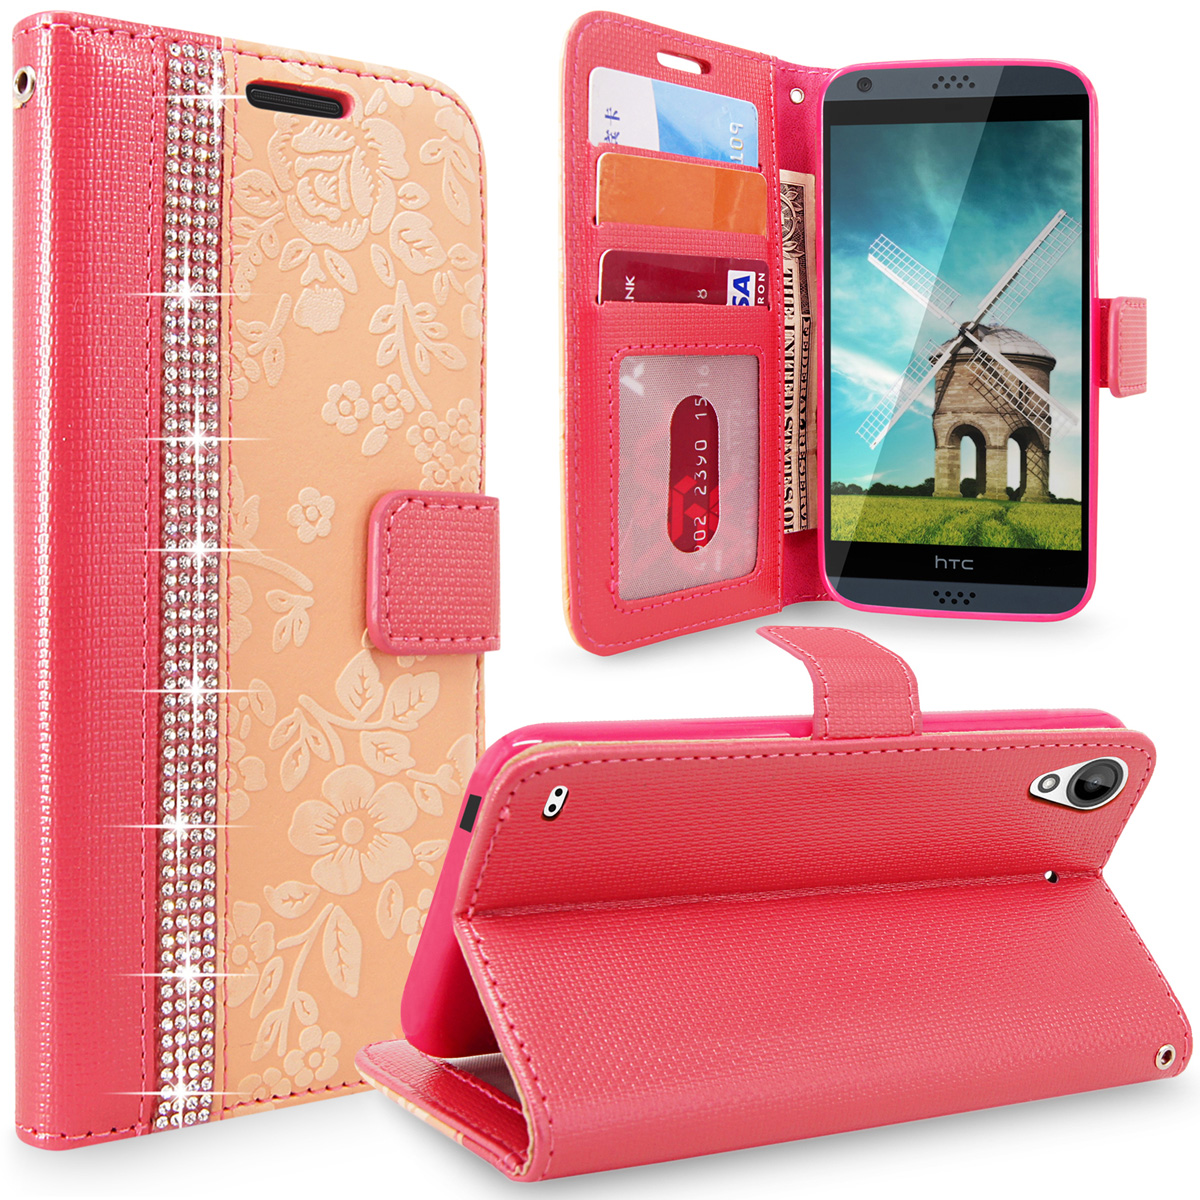 HTC-530-EMBS-WLT-P-PNK